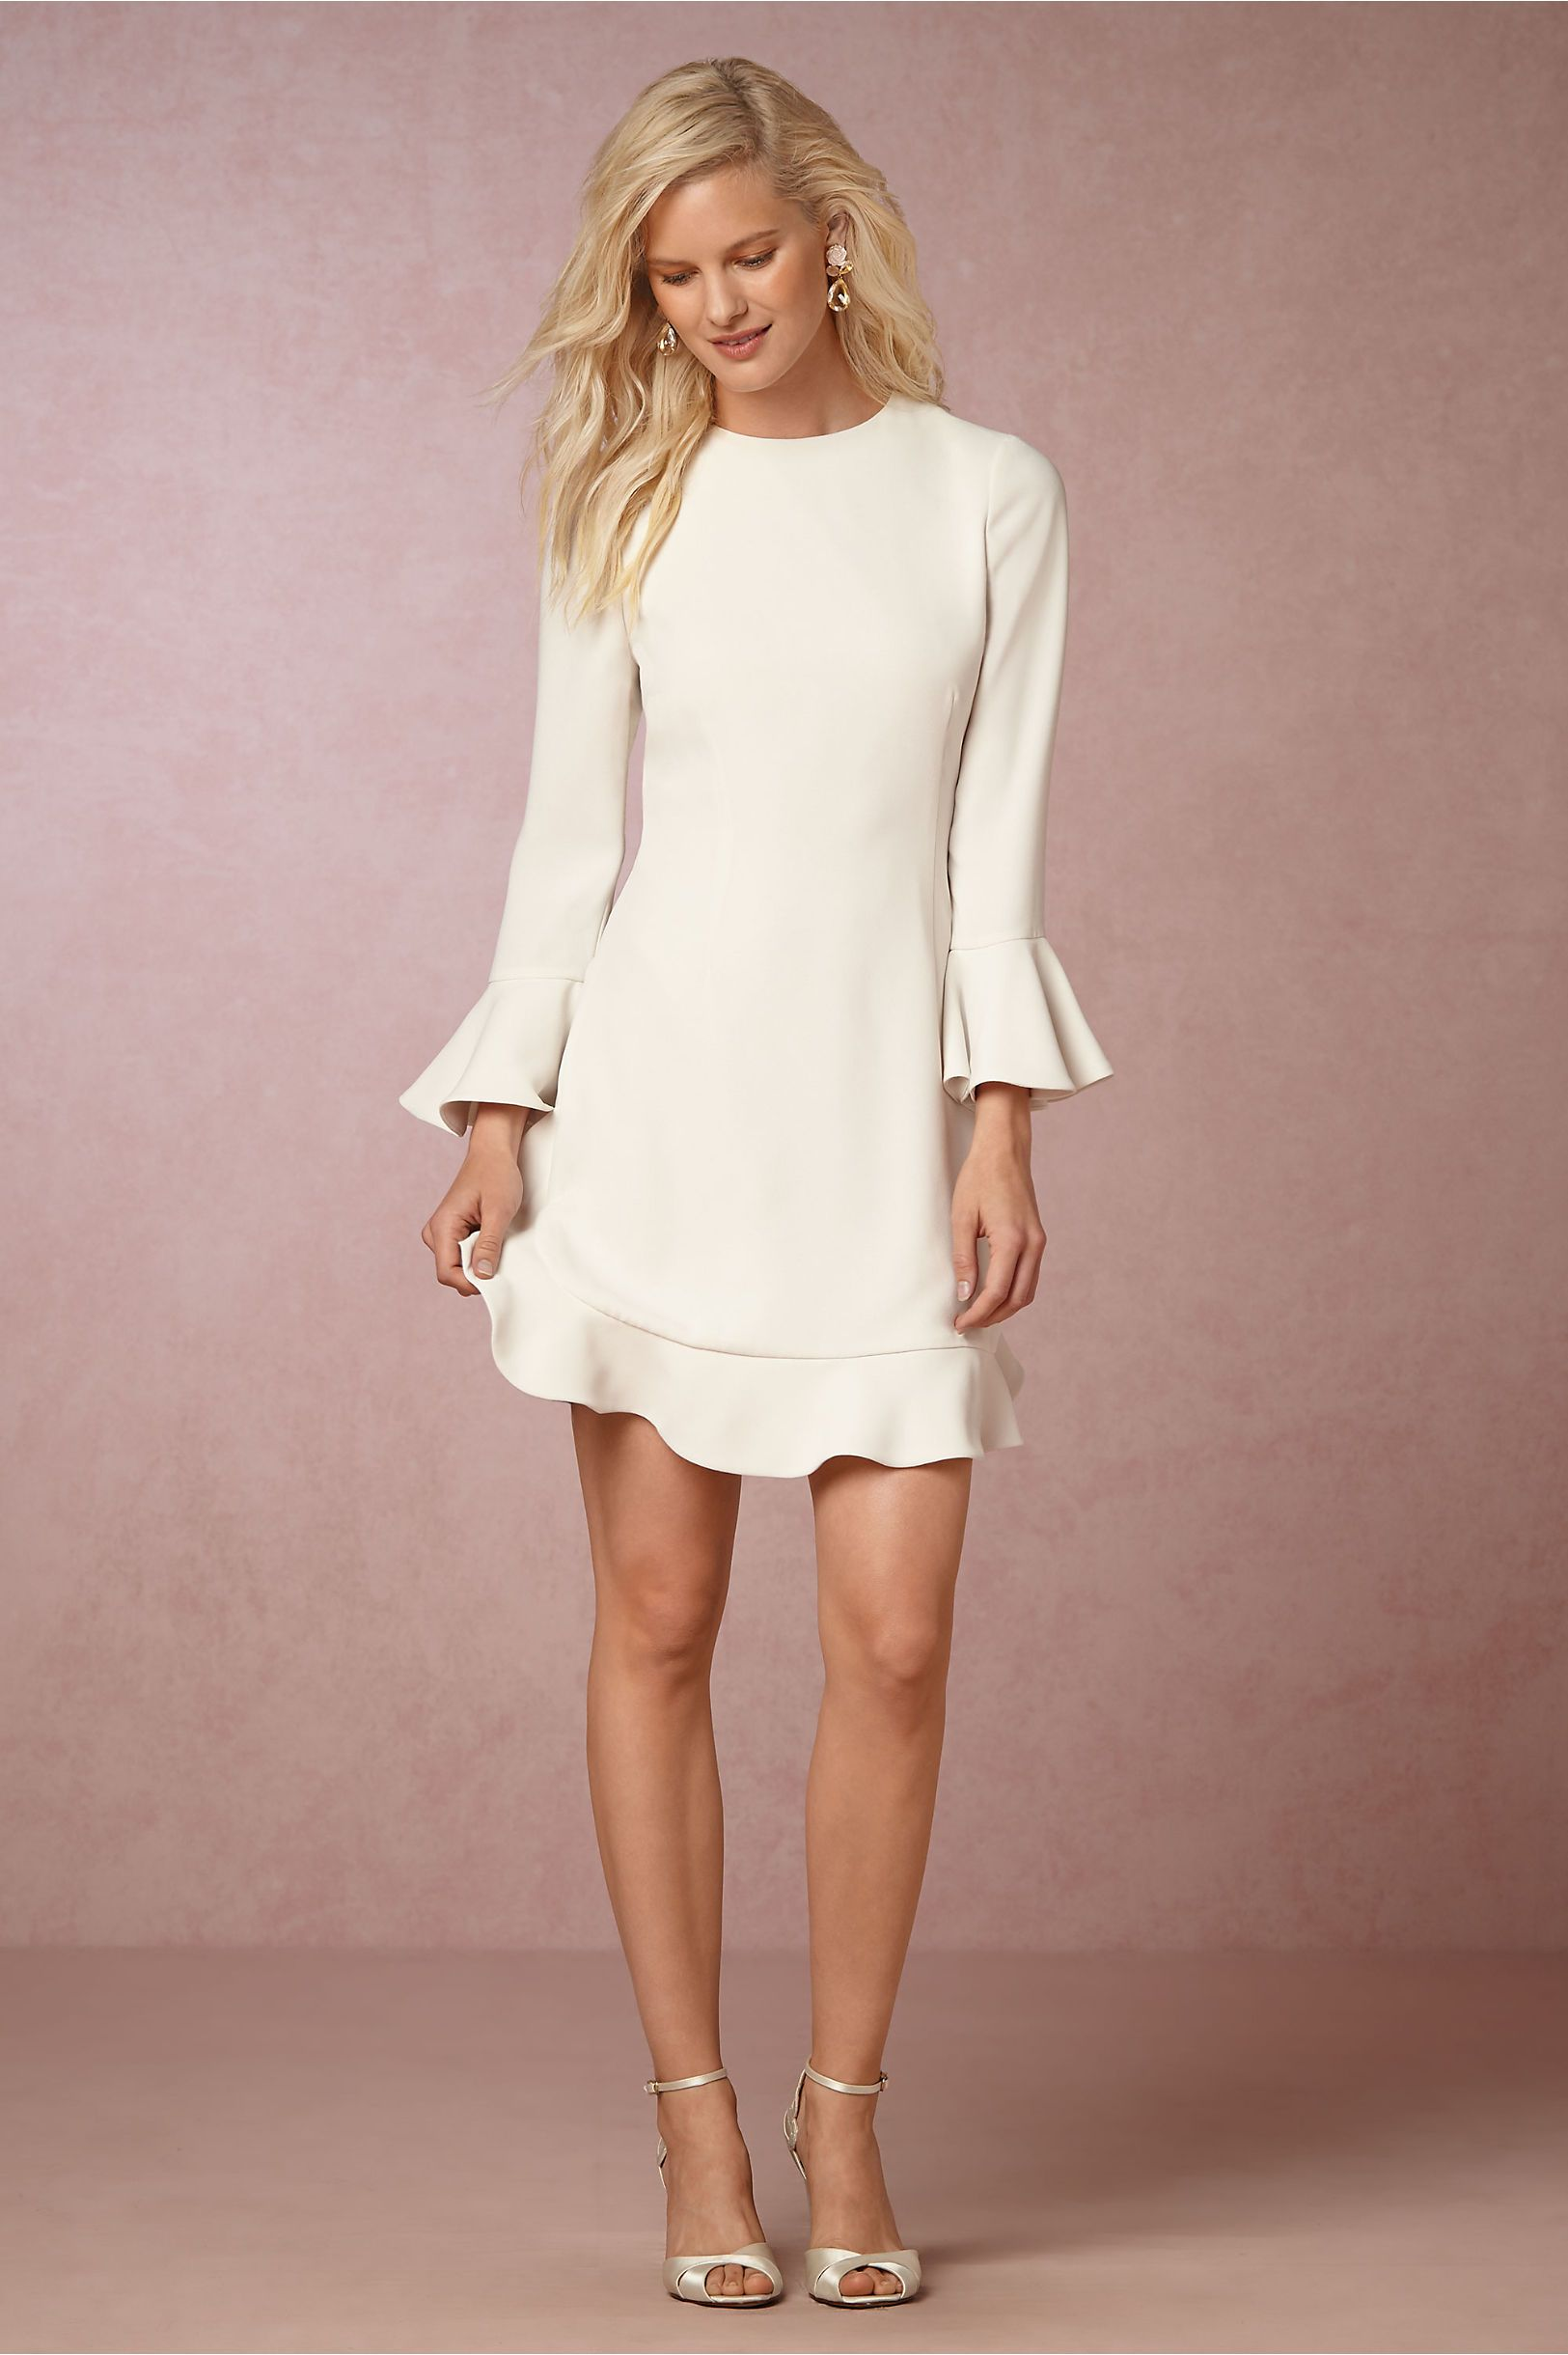 Short white dresses for wedding reception  BHLDN Jenny Dress in Bride Reception u Rehearsal Dresses  BHLDN